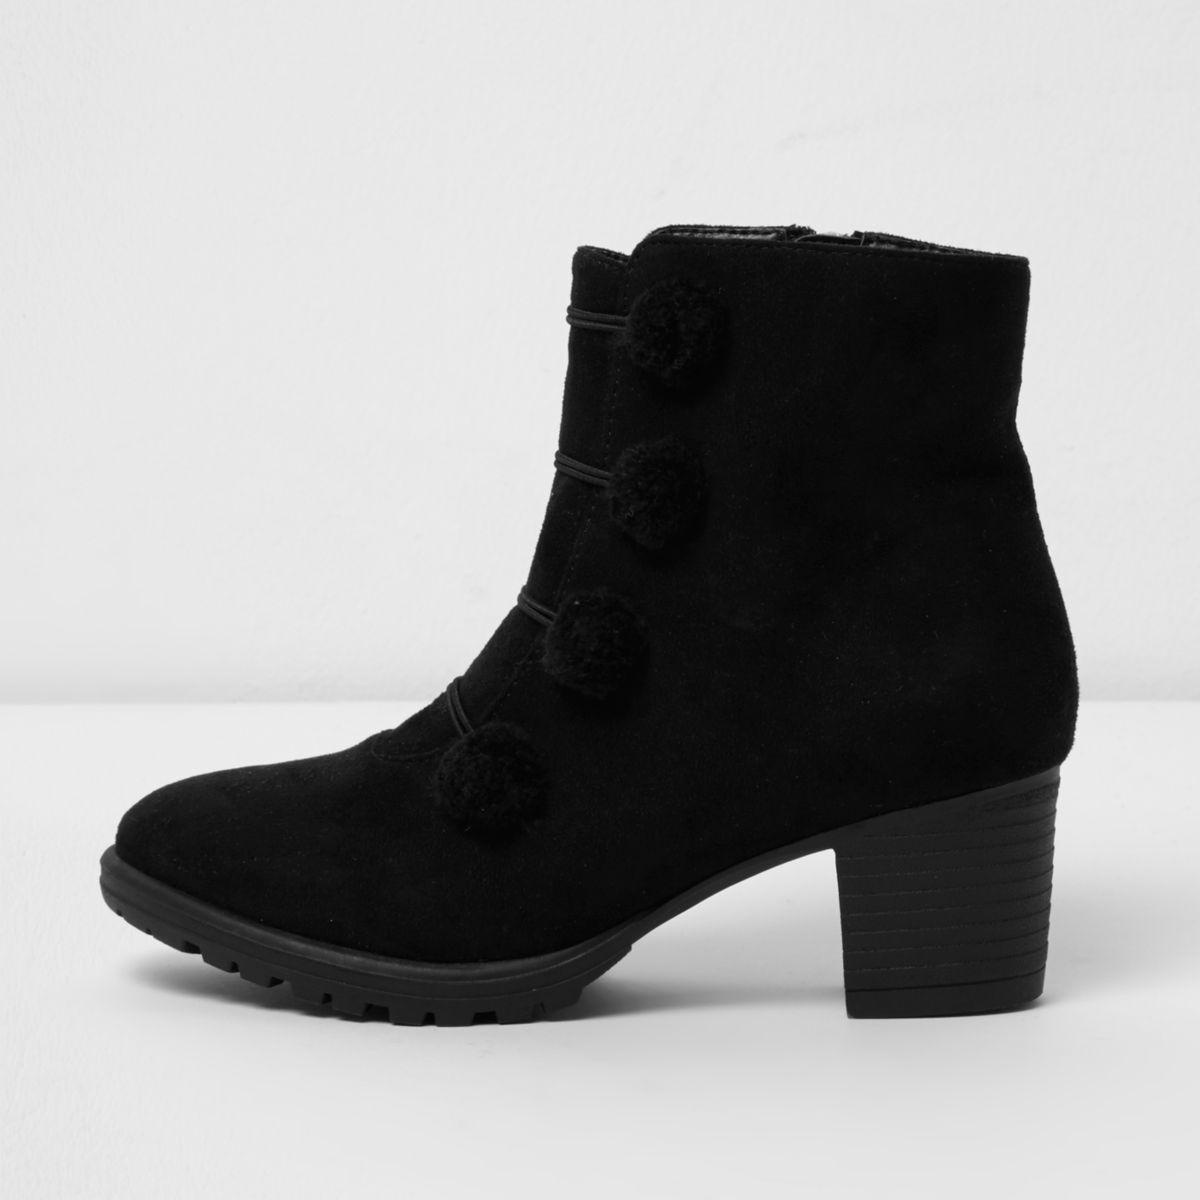 Girls black military style pom pom boots